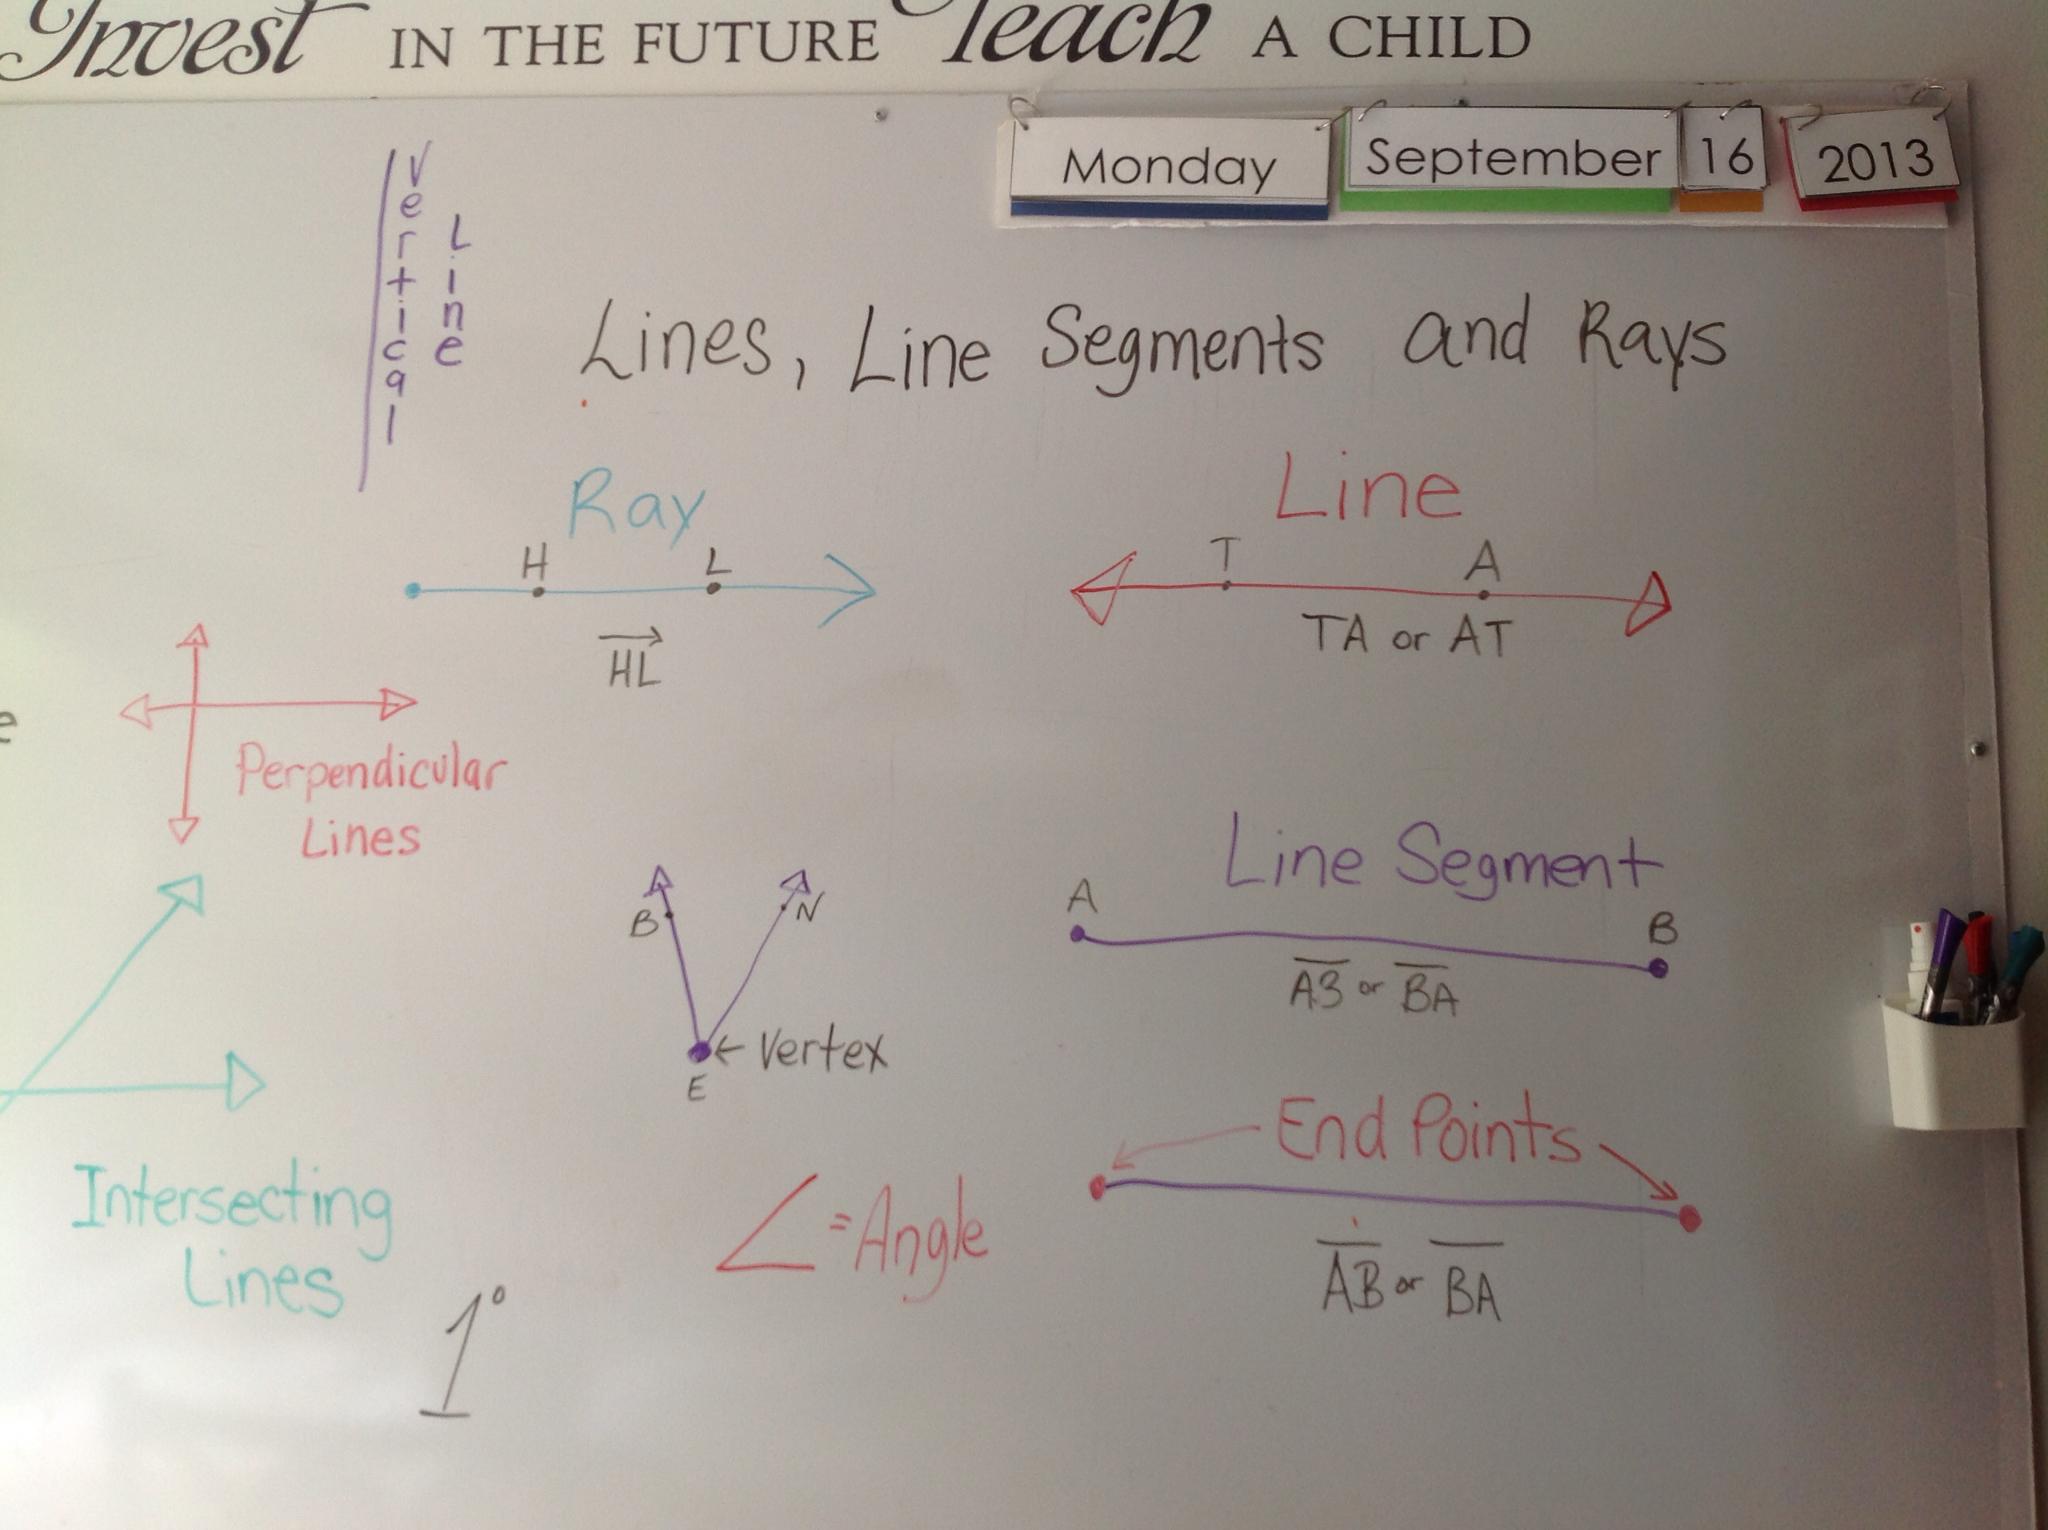 My Three Seeds Of Joy Homeschool Lines Line Segments And